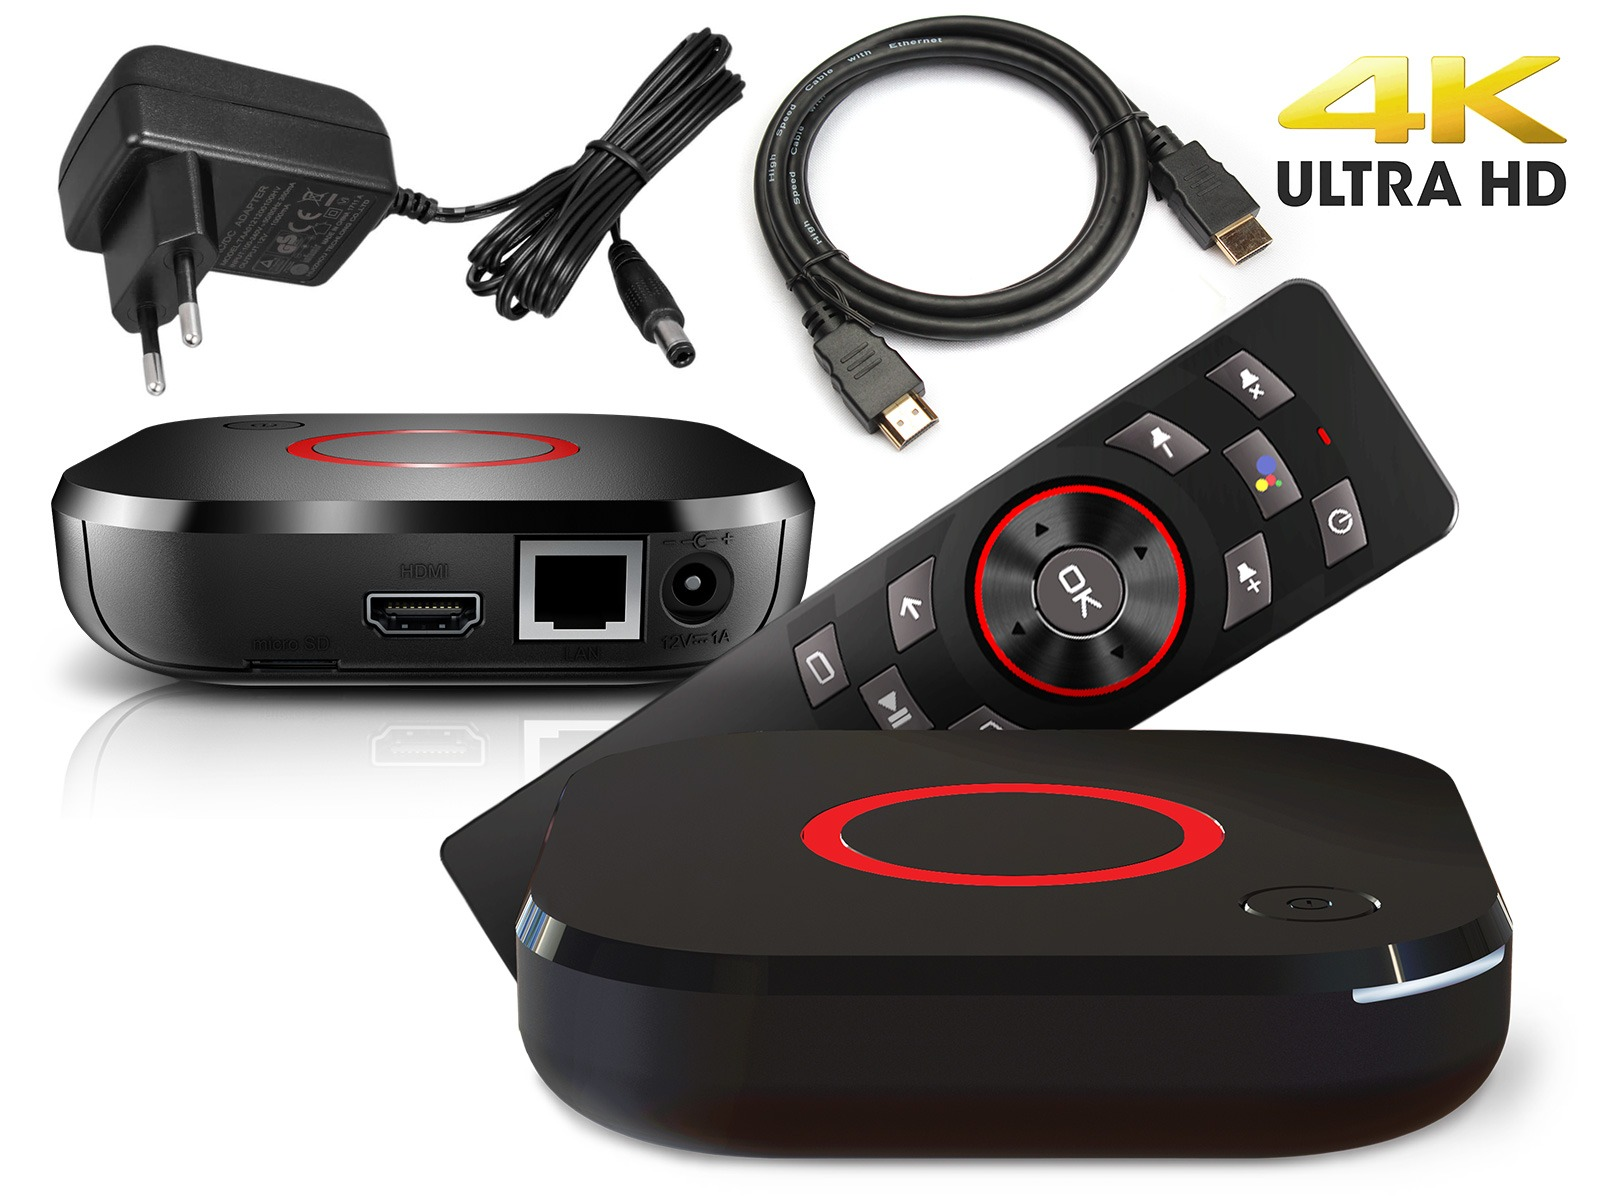 MAG 425A Android TV 8.0 4K HEVC 5G WIFI Bluetooth Sprachfernbedienung Chromecast IPTV Player